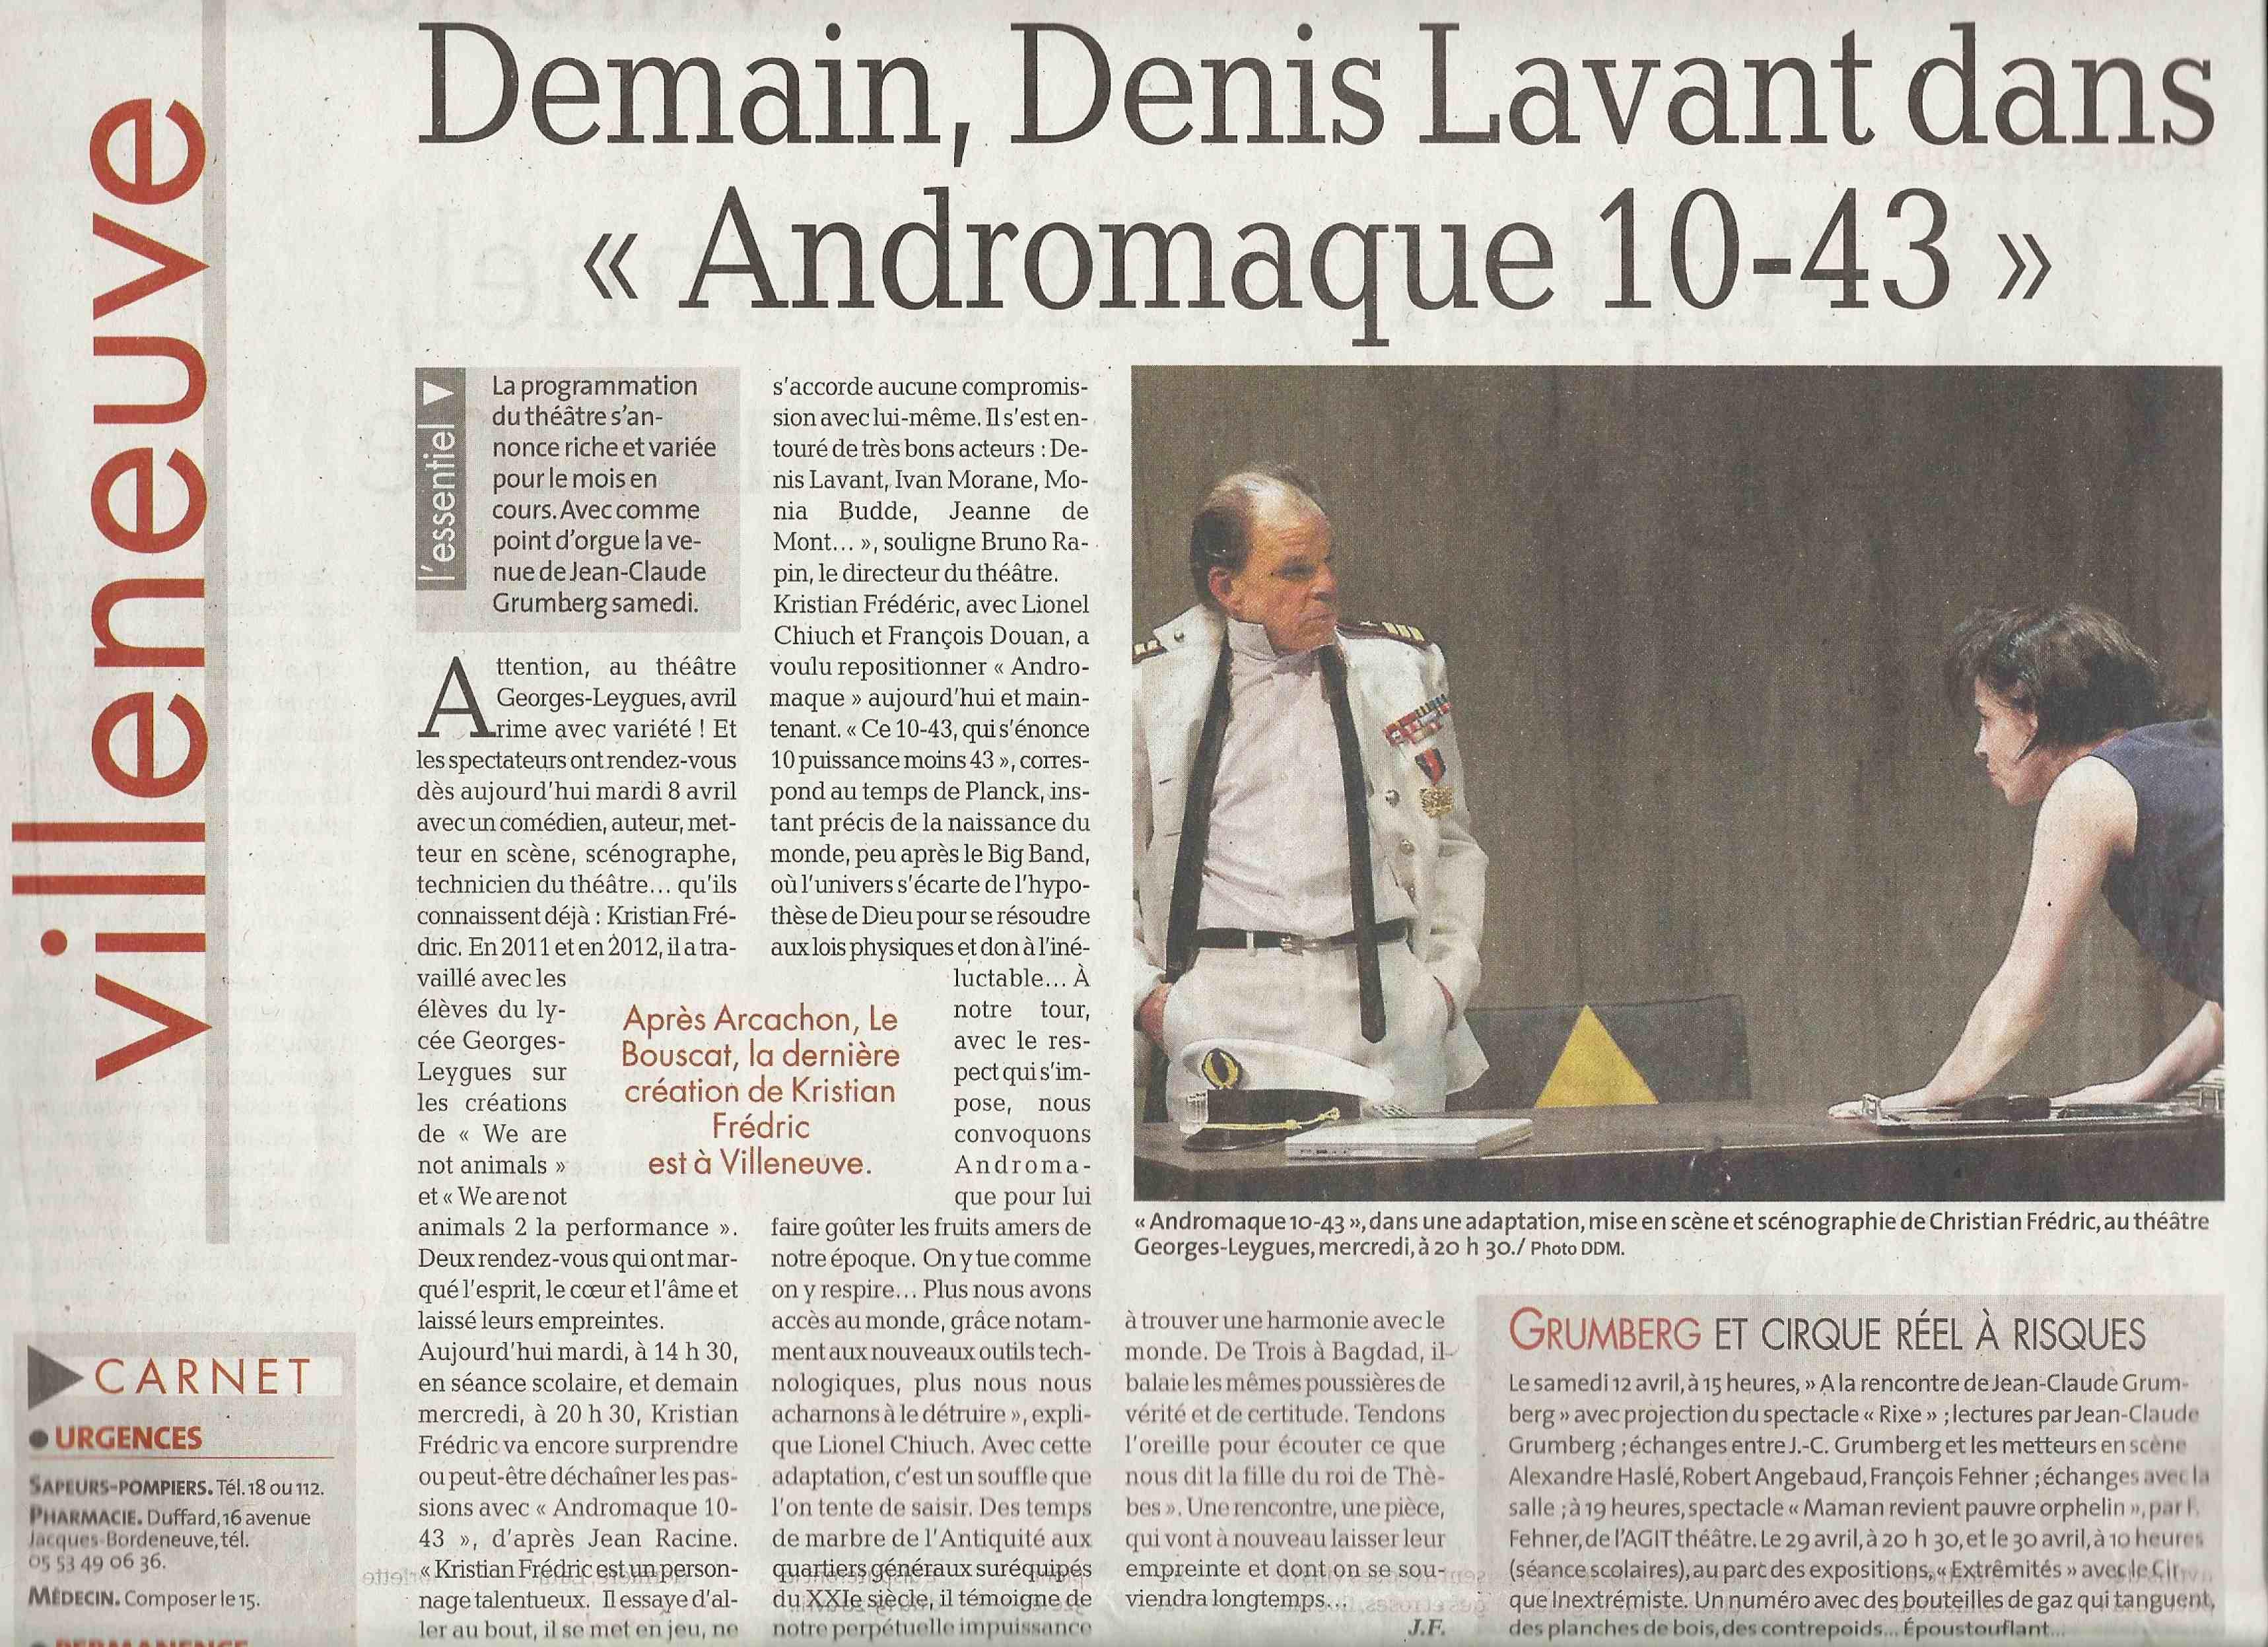 Andromaque 10-43